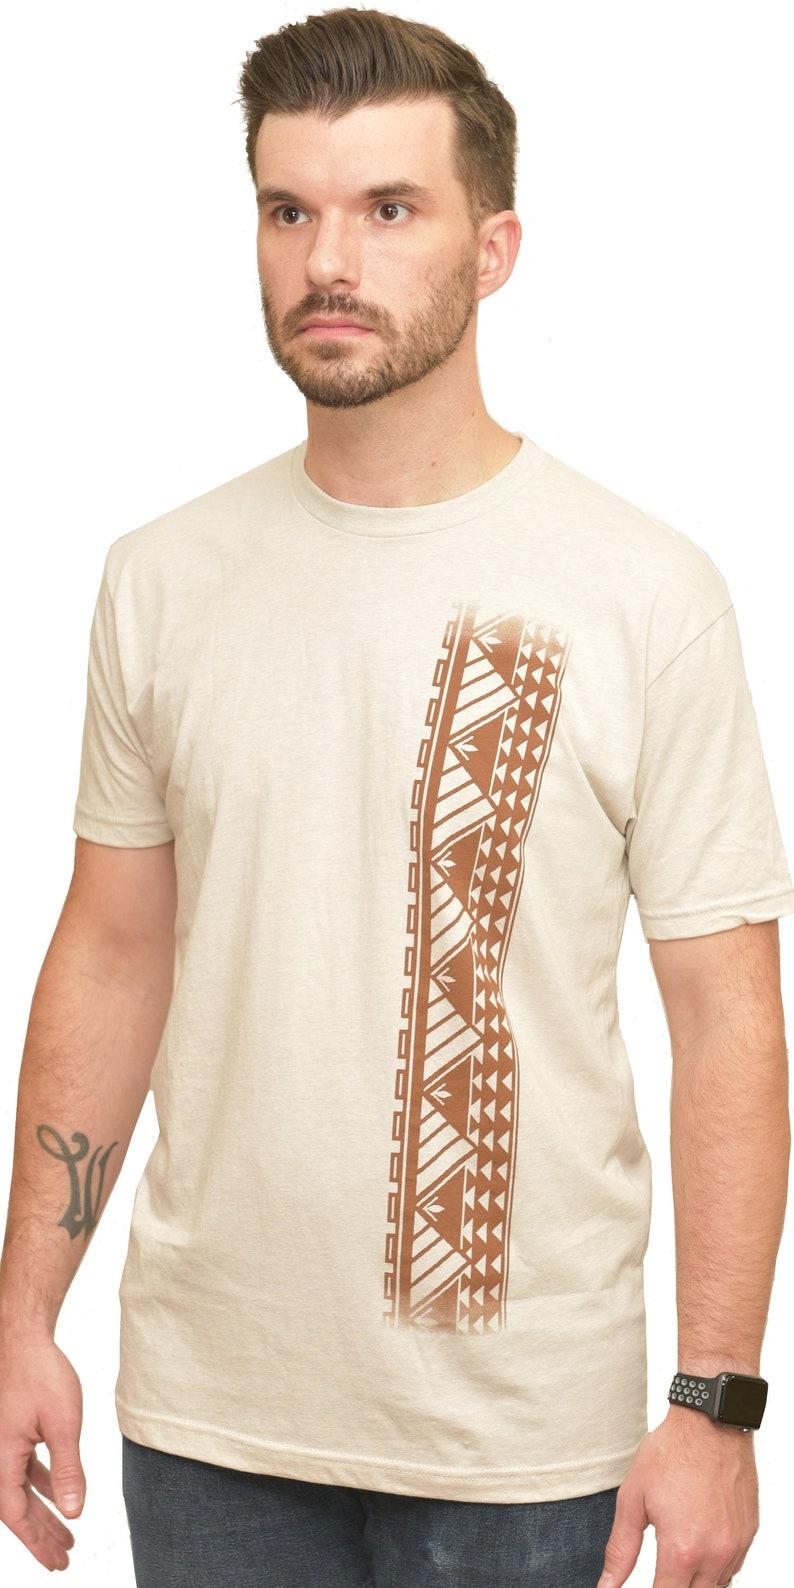 9c015d2e1e2c Ori Active Men's Long Sleeve Cotton Shirt with Samoan   Etsy